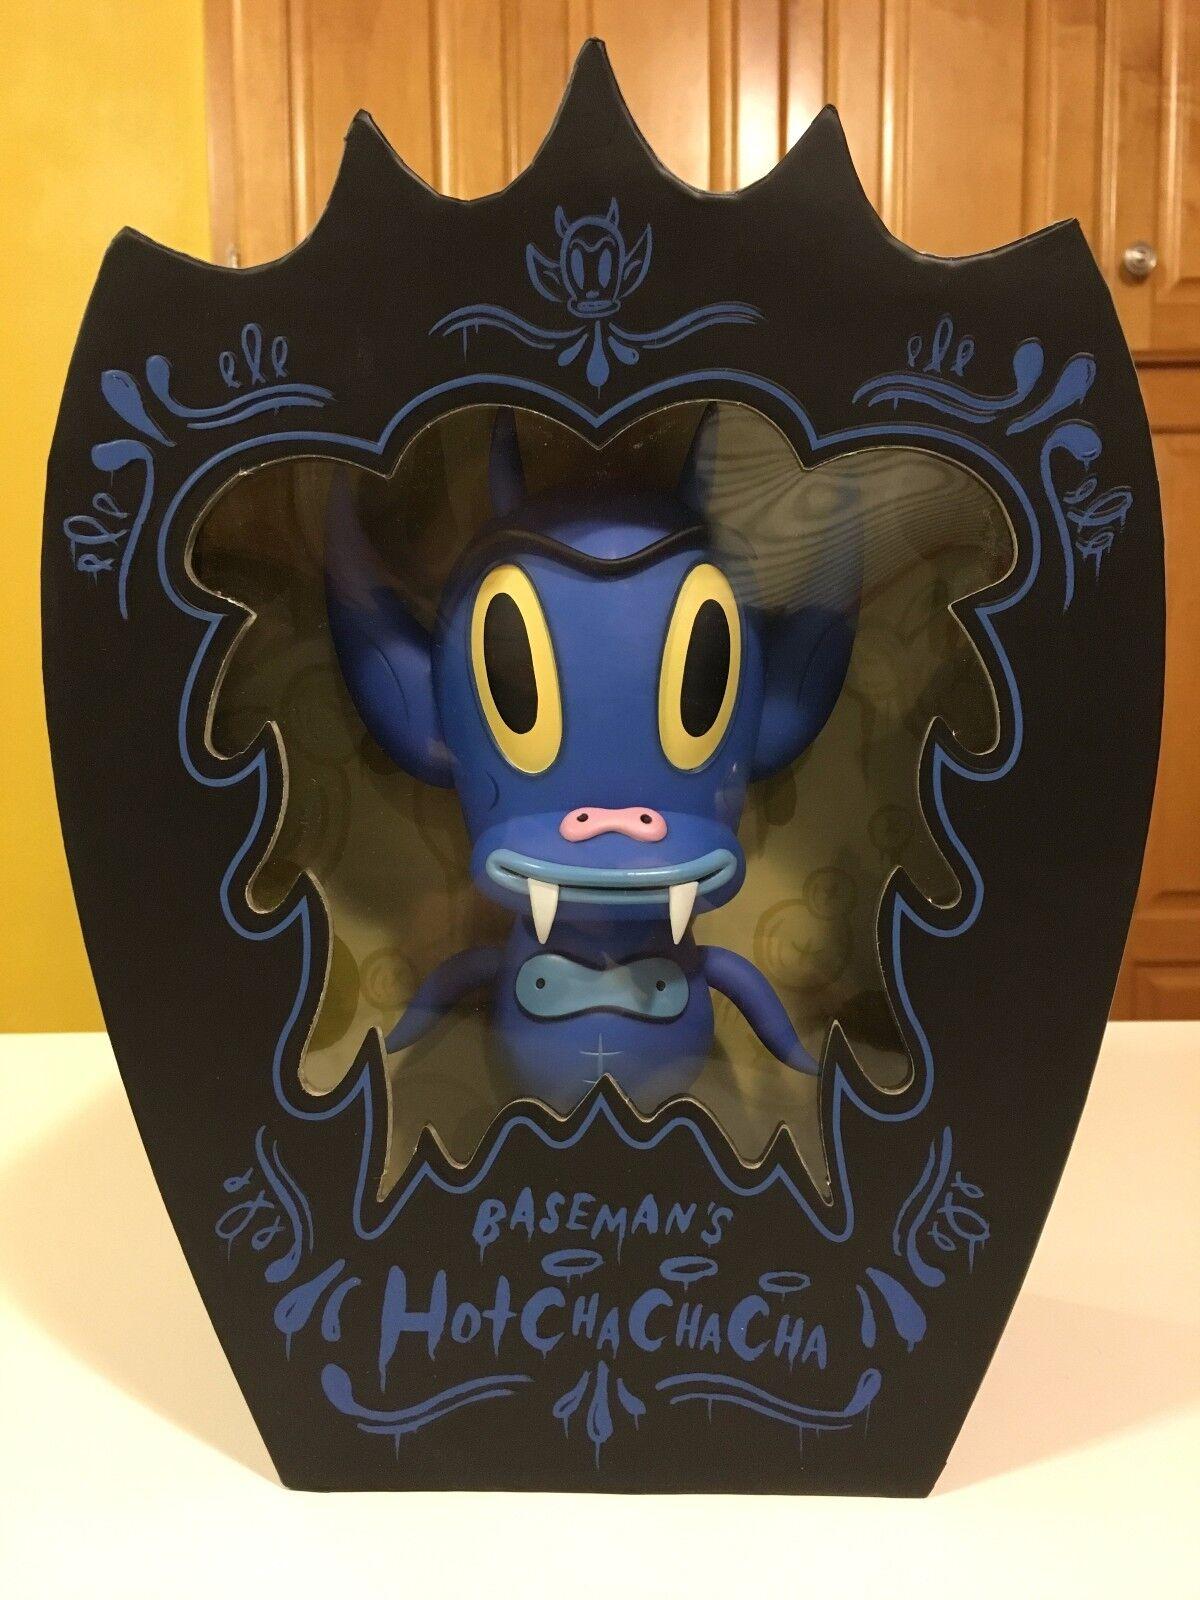 Gary Baseman Hot Cha Cha Cha Blau Vinyl Figure LMTD ED 500 & SIGNED